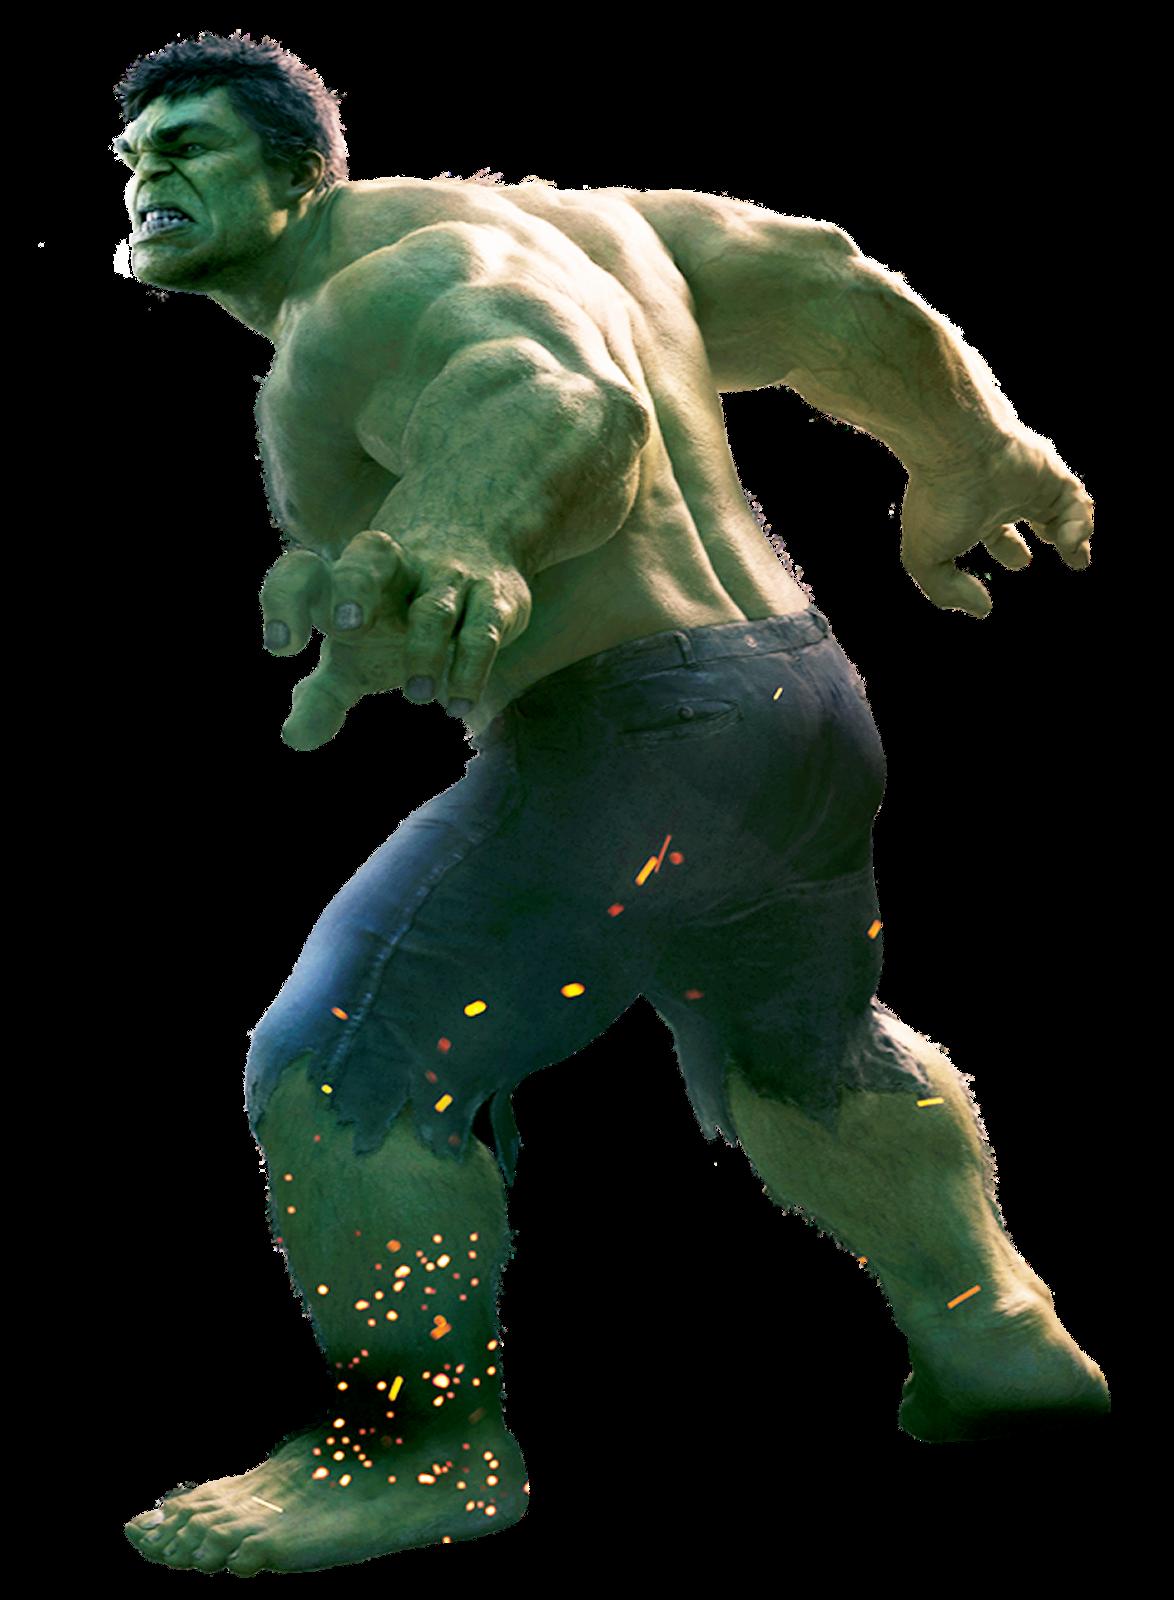 Hulk Gallery Disney Wiki Fandom Powered By Wikia Comic Books Illustration Hulk Avengers Hulk Marvel